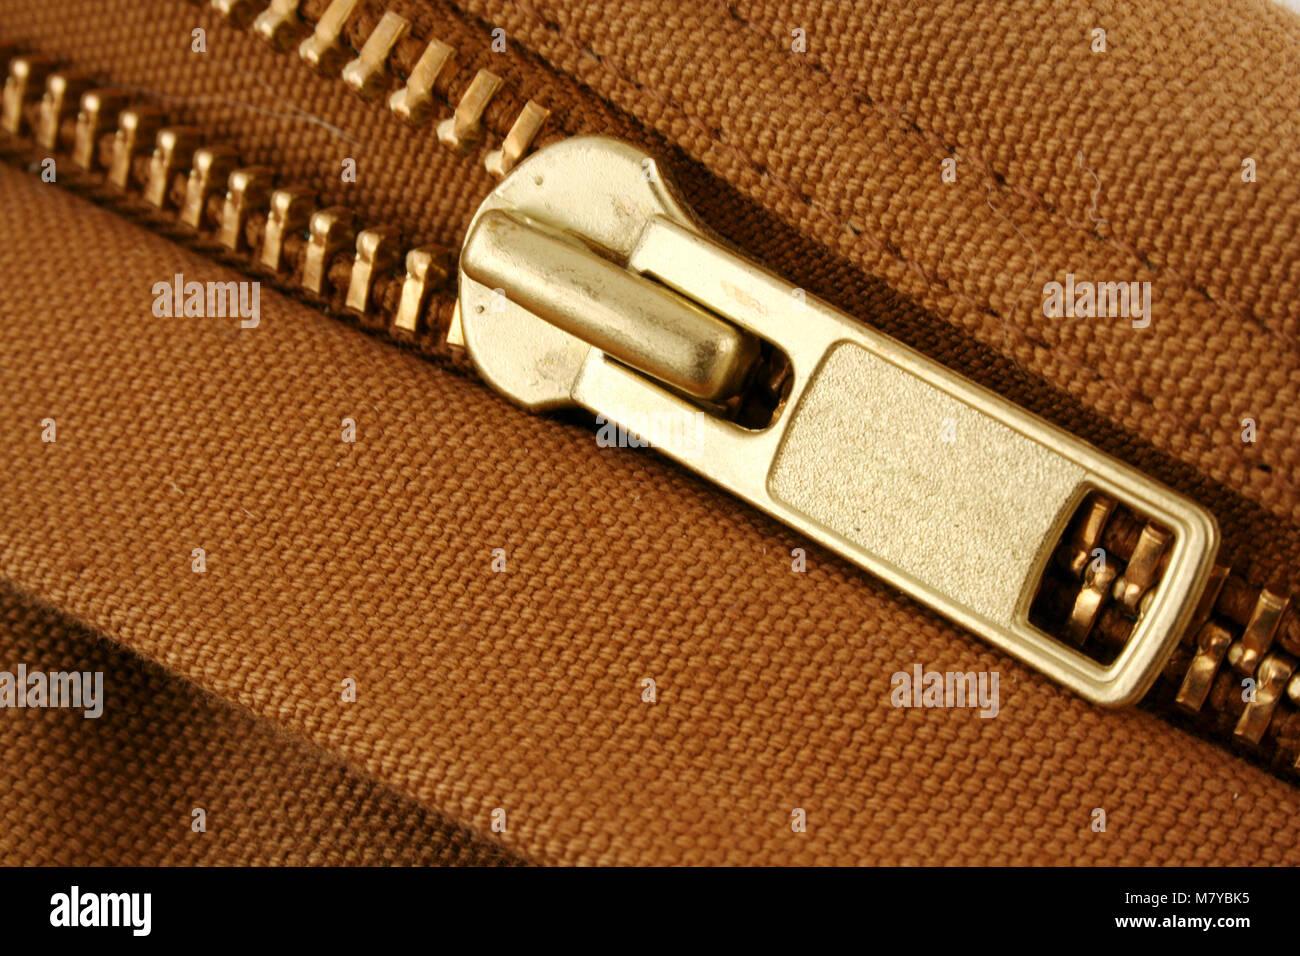 A Large gold zipper macro - Stock Image